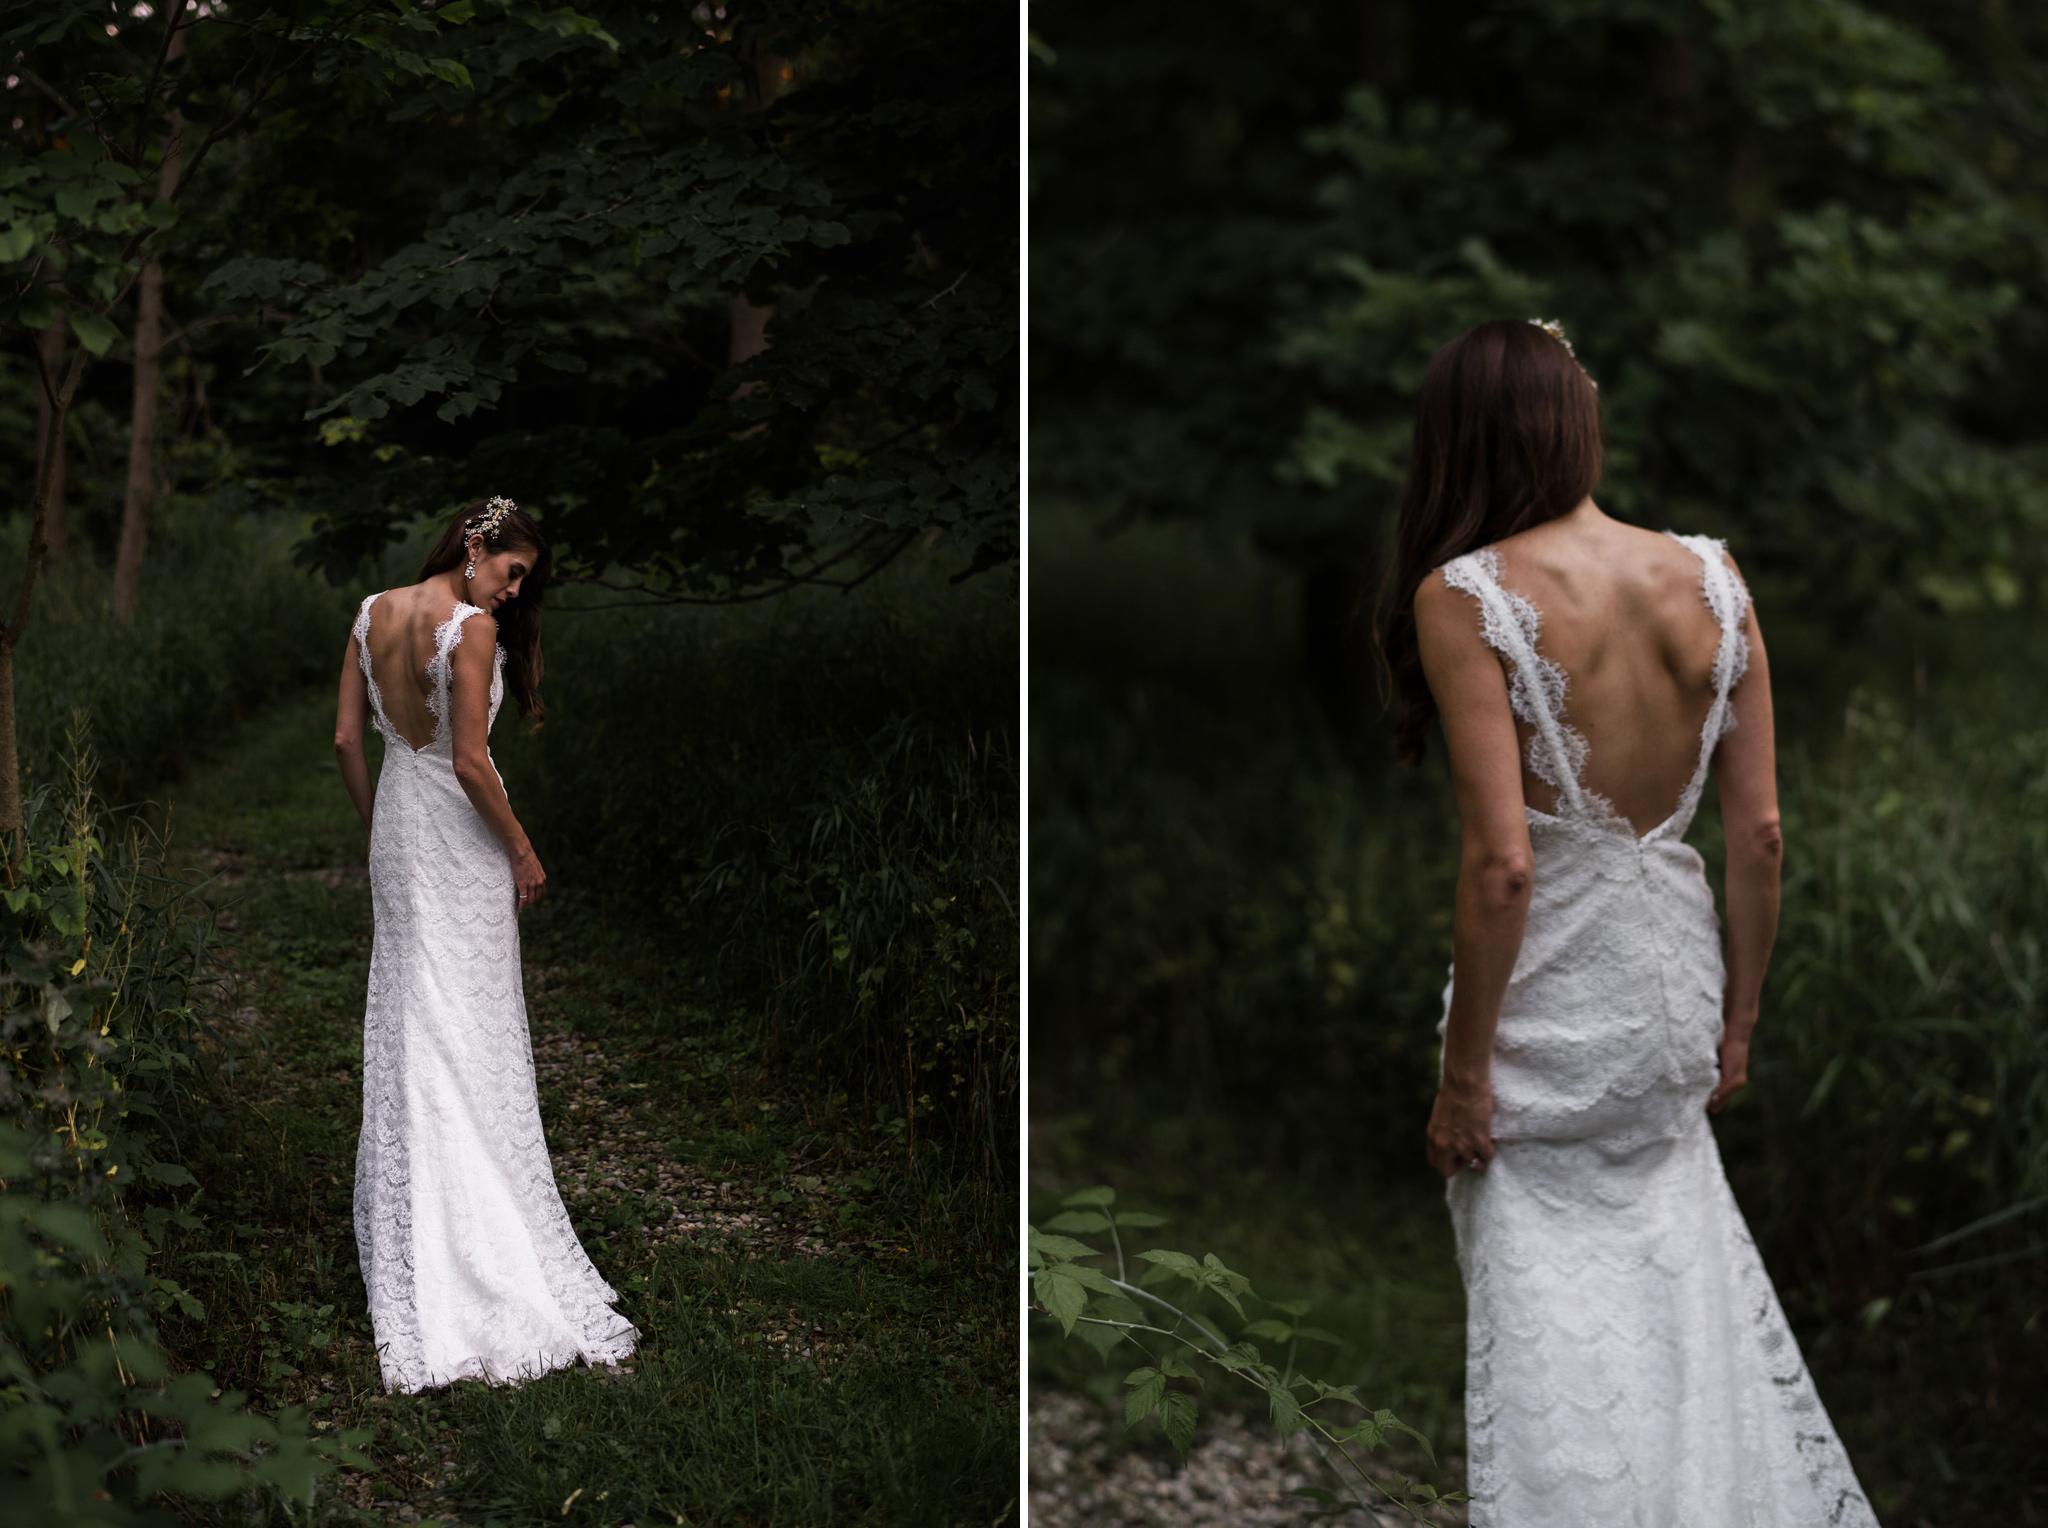 093-sydenham-ridge-wedding-bride-groom-portraits-toronto-wedding-photographer.jpg